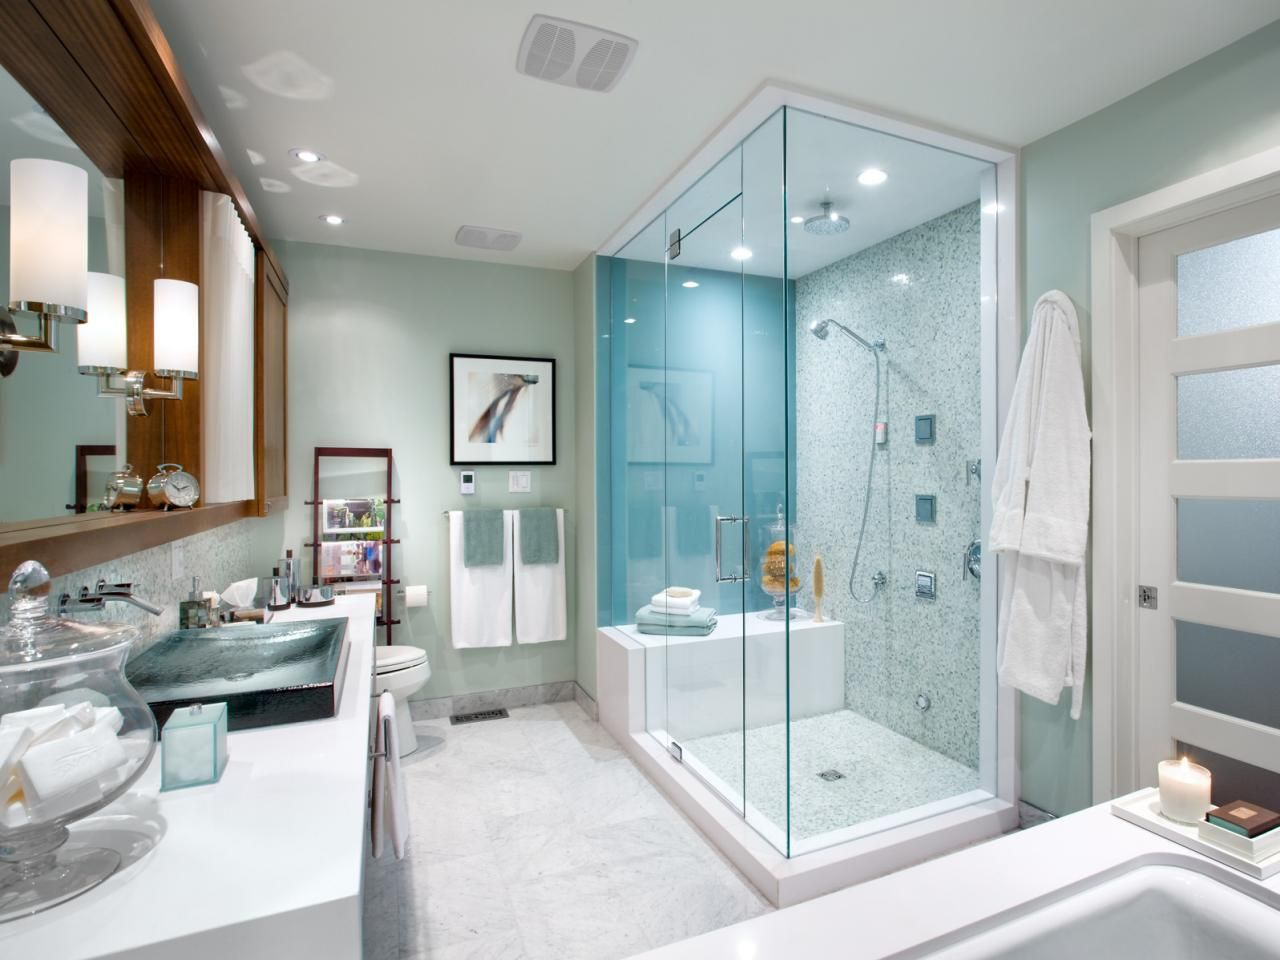 Candice Olson Bathroom Design Bathroom Renovation Ideas From Candice Olson  White Quartz